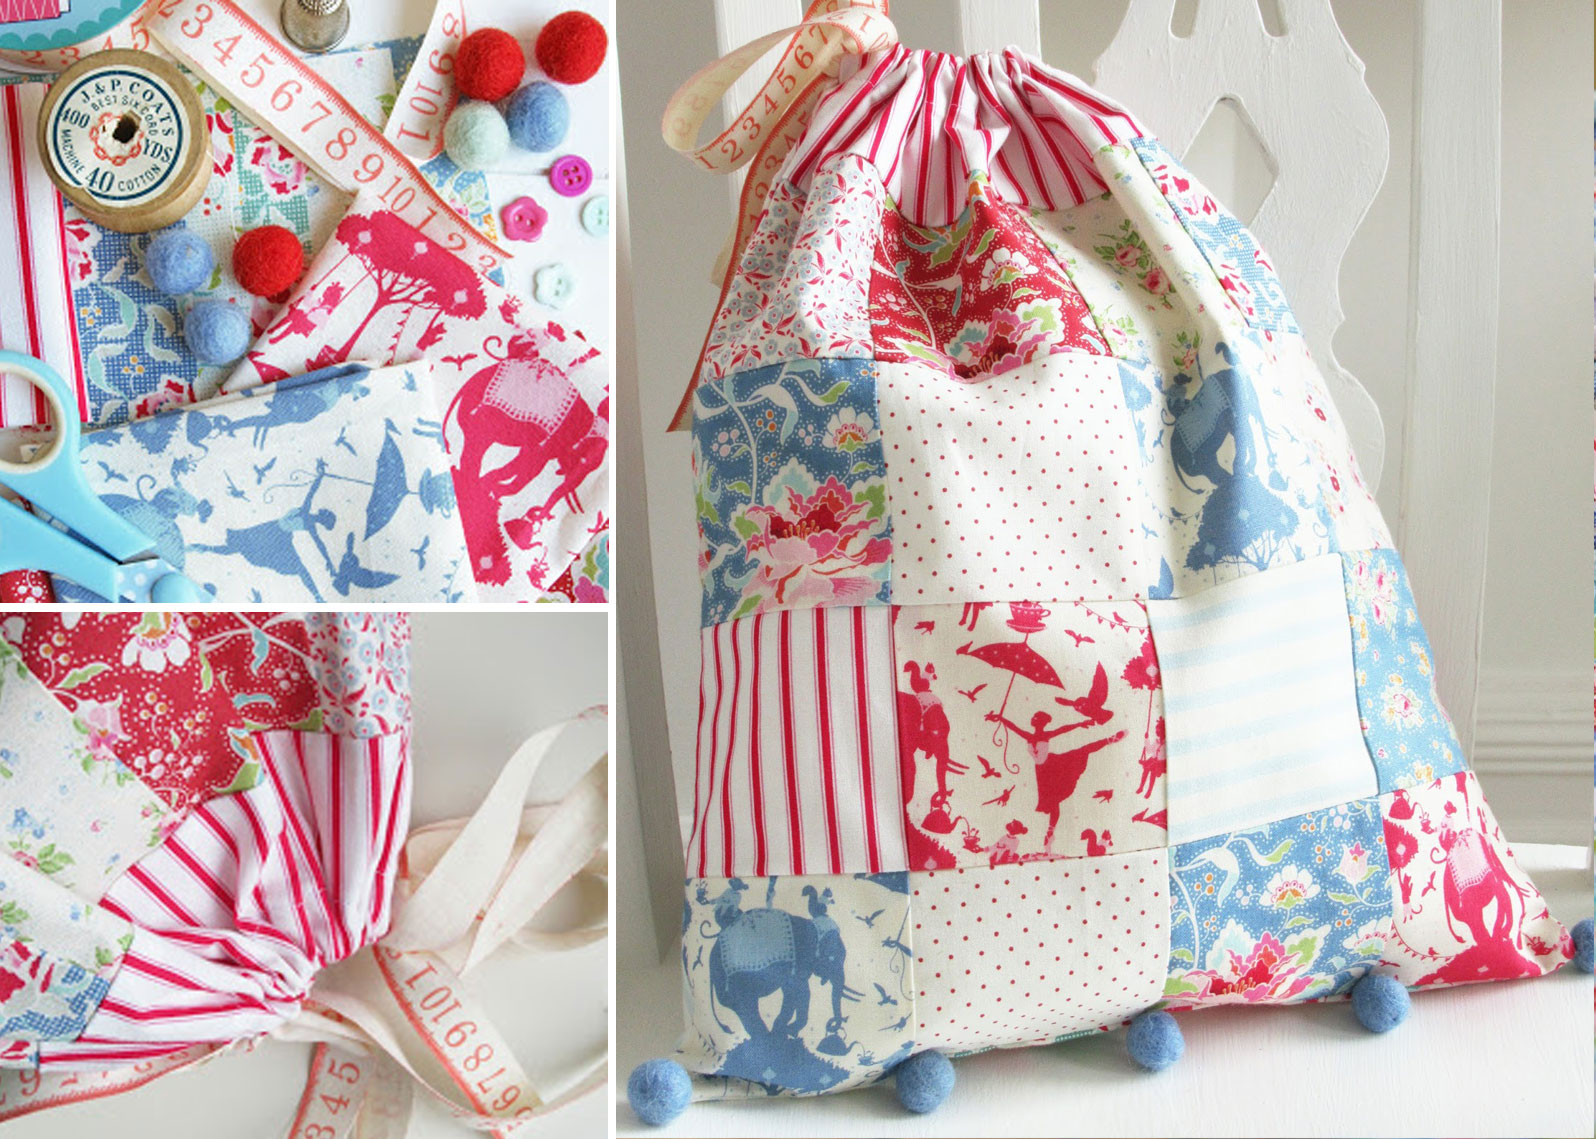 Helen-Philipps-Patchwork-Drawstring-Bag